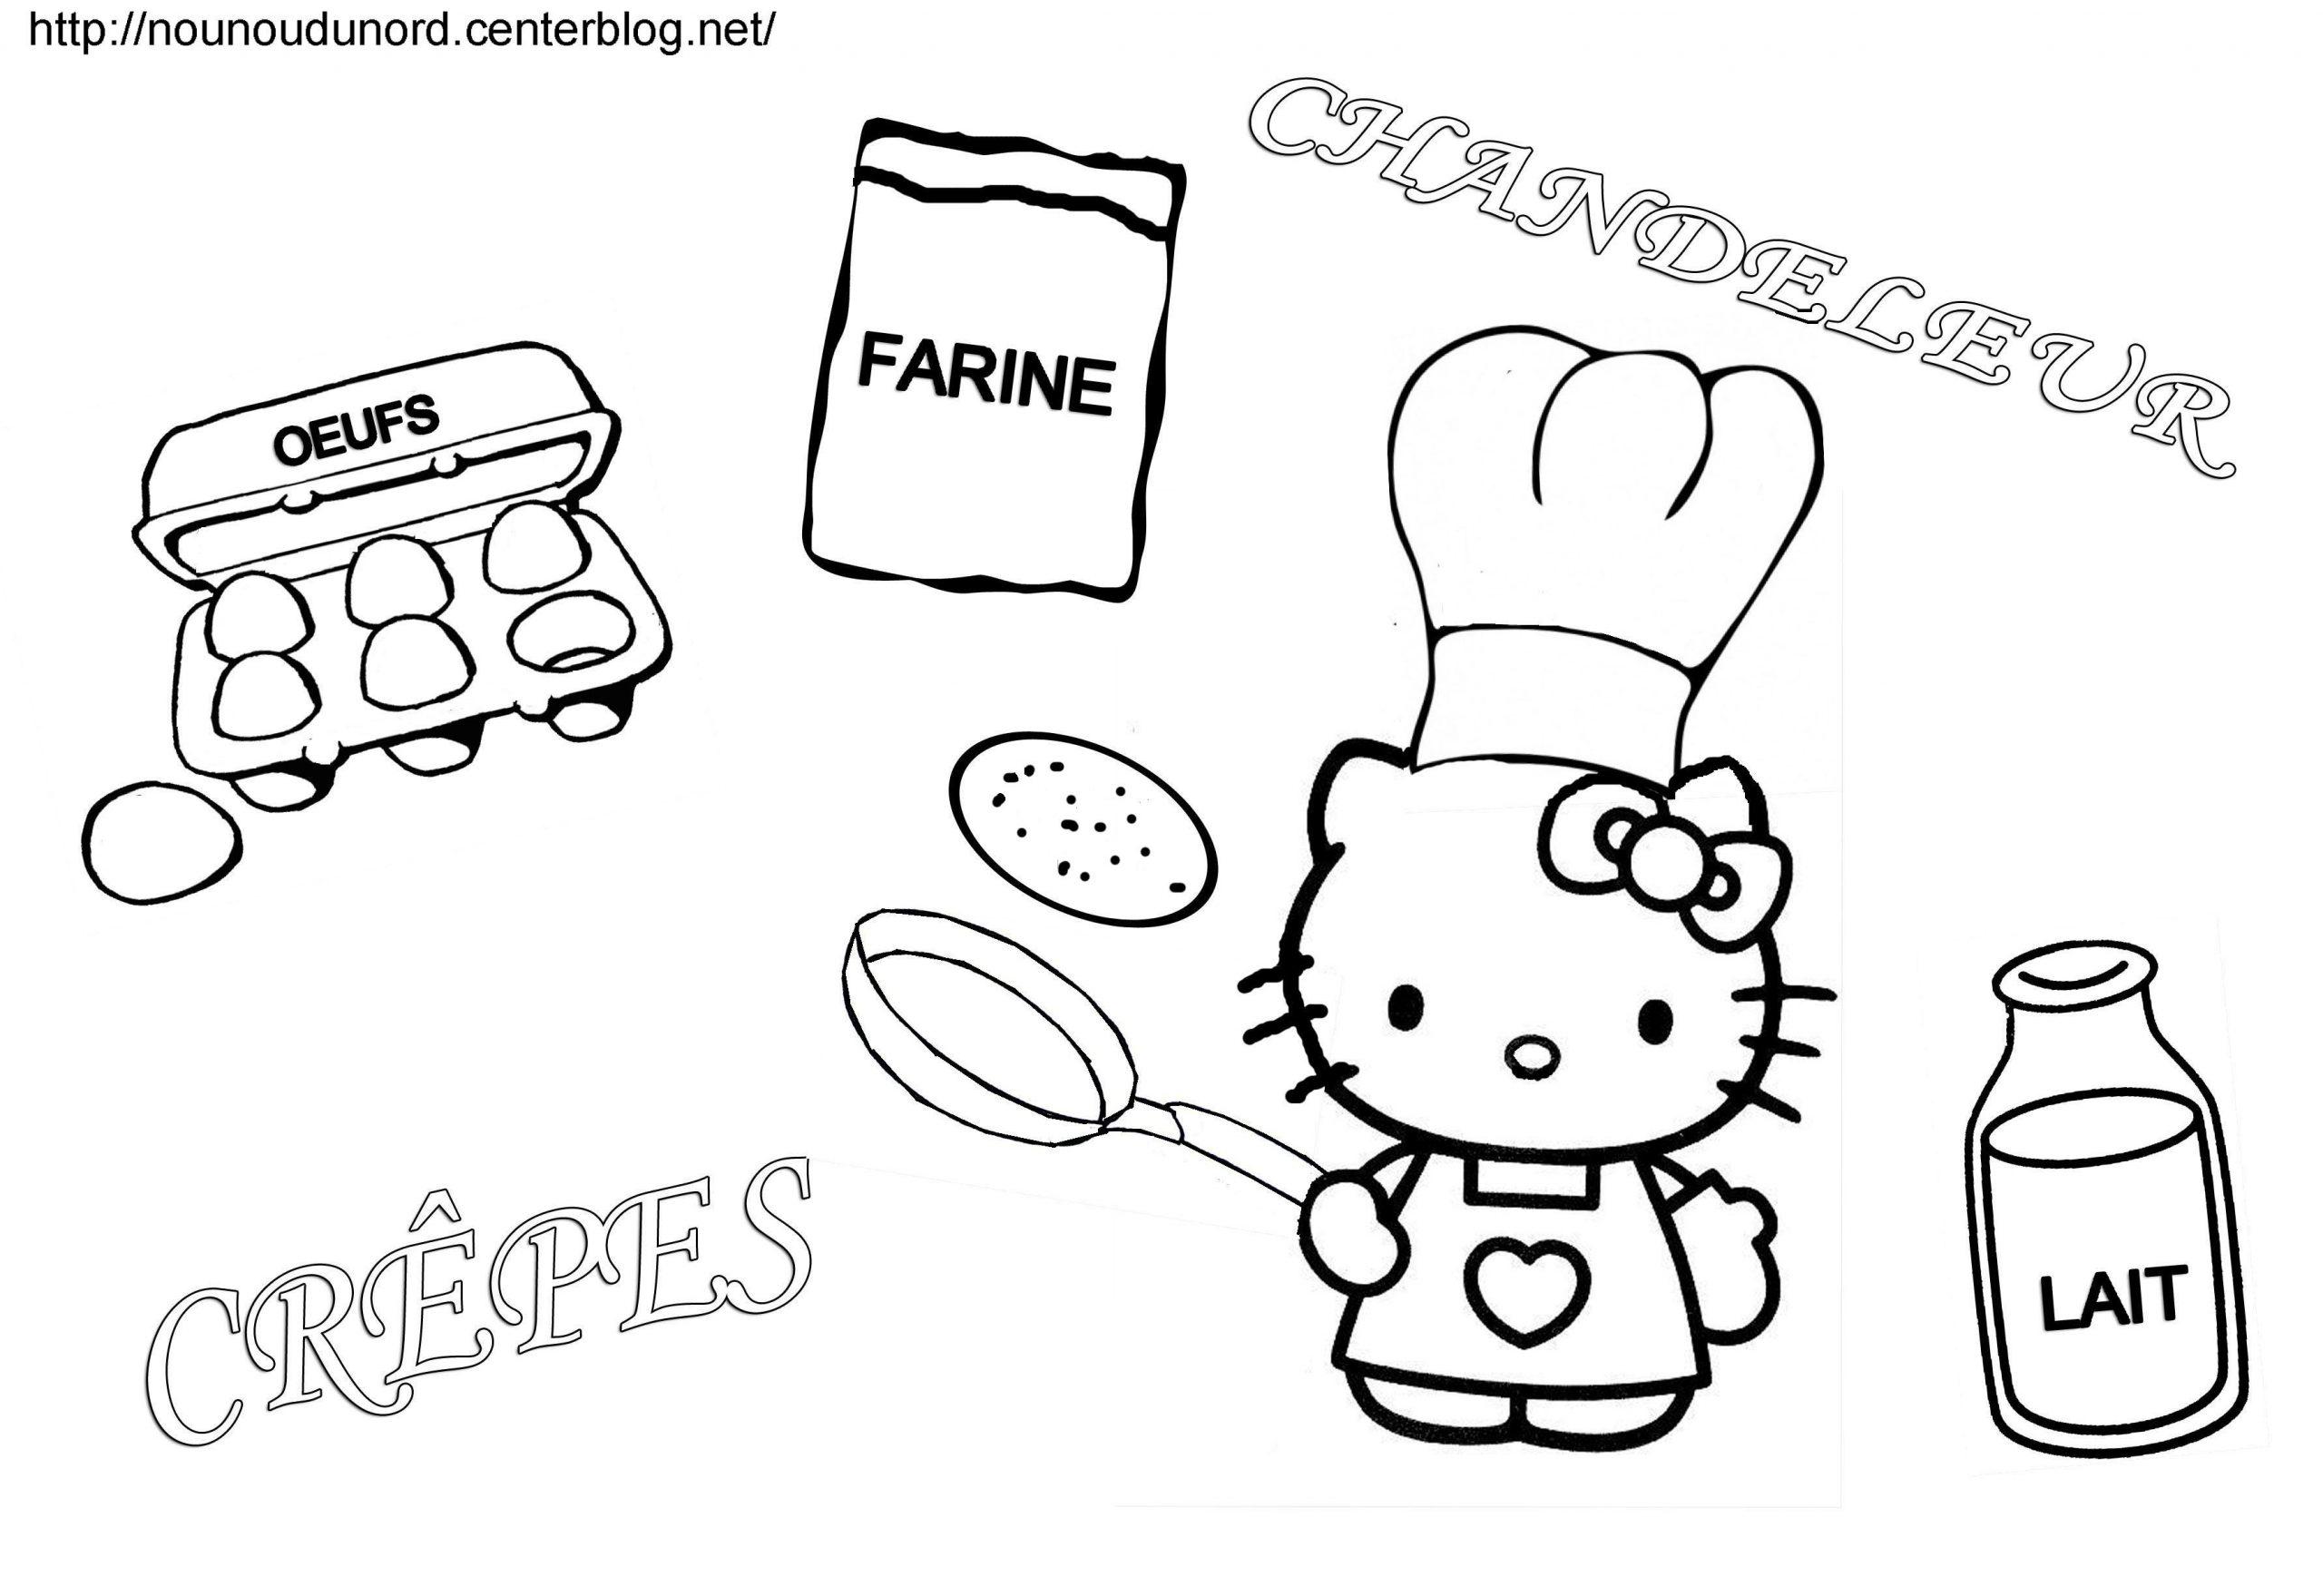 Coloriage Hello Kitty #36933 (Dessins Animés) - Album De à Hello Kitty Dessin Animé En Francais